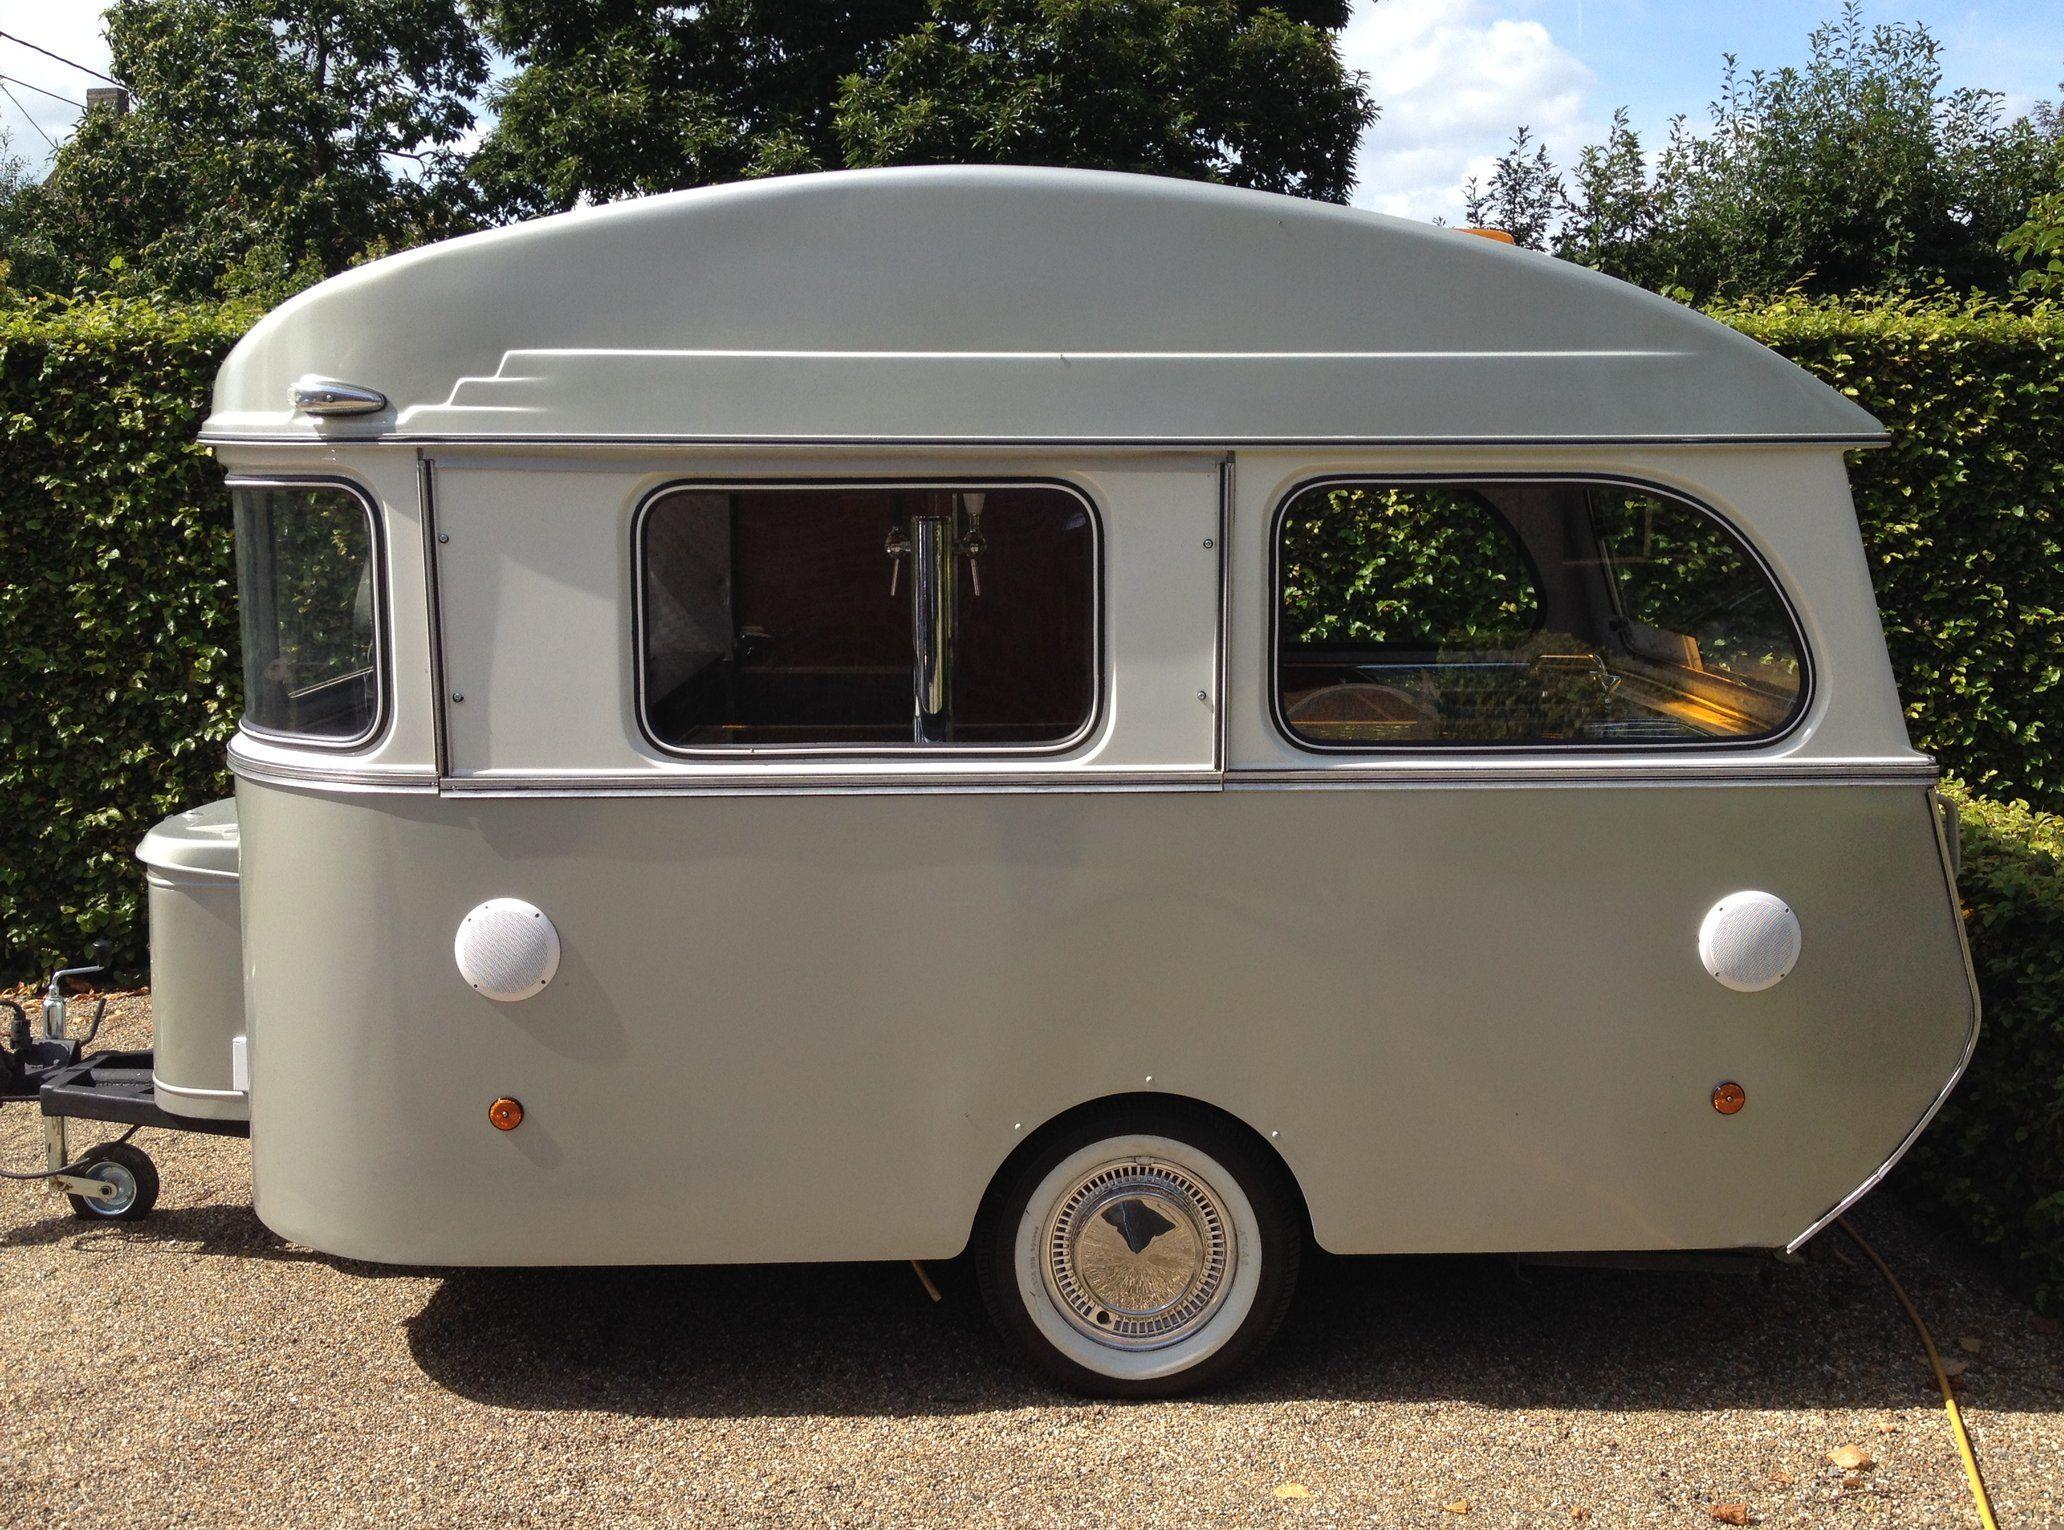 De merknaam Caravan vintage, Caravan makeover, Caravan